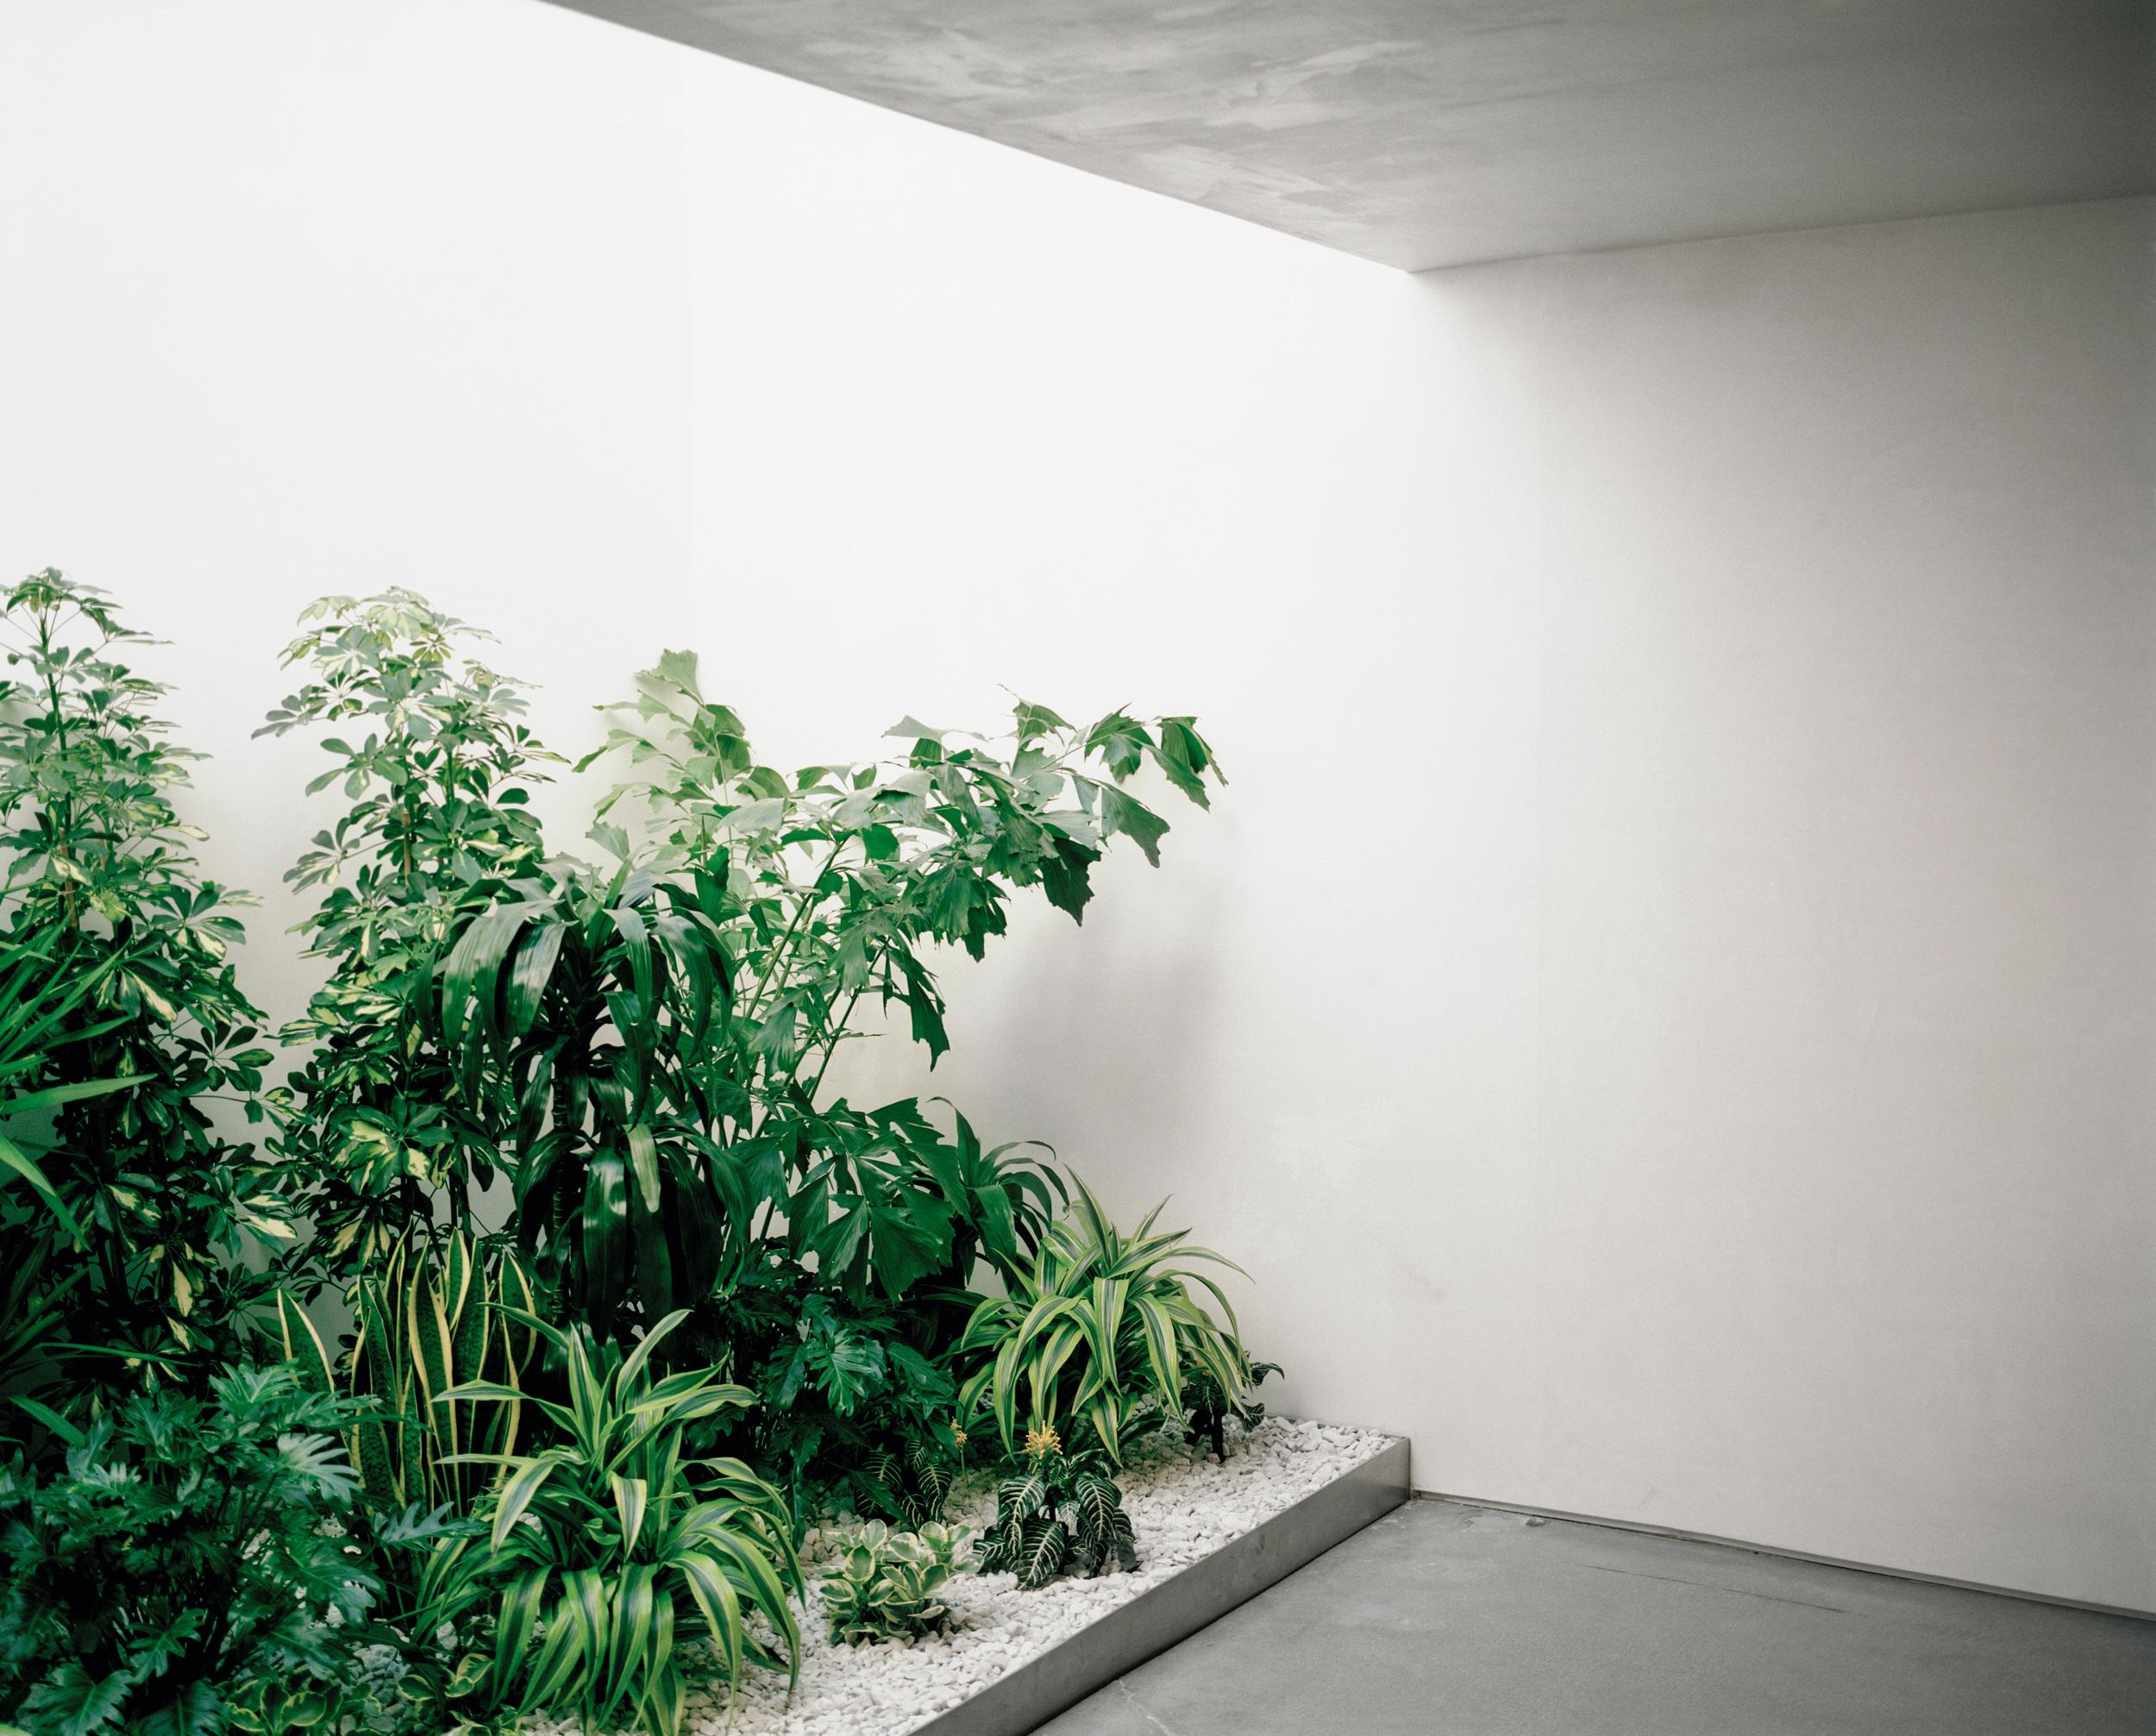 hlang_plants.jpg